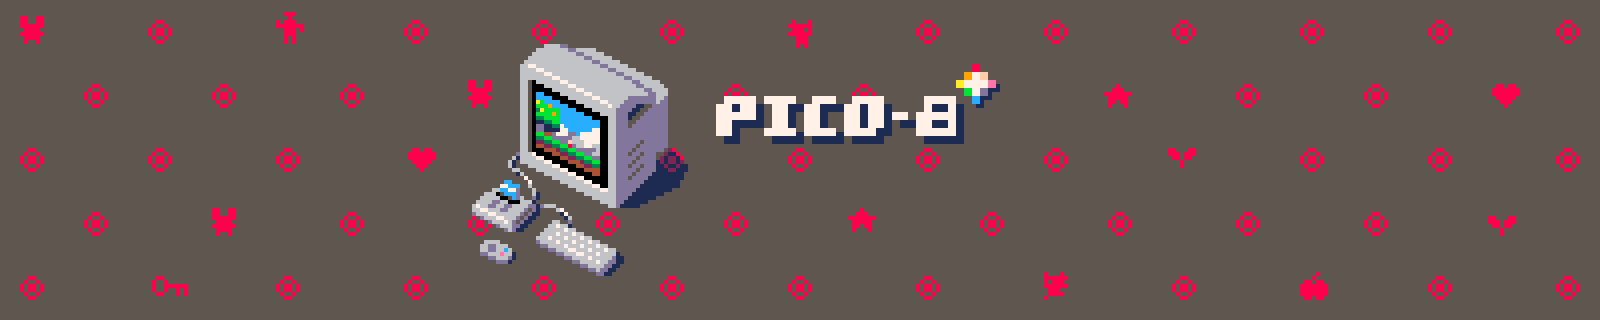 h800_pico8.png